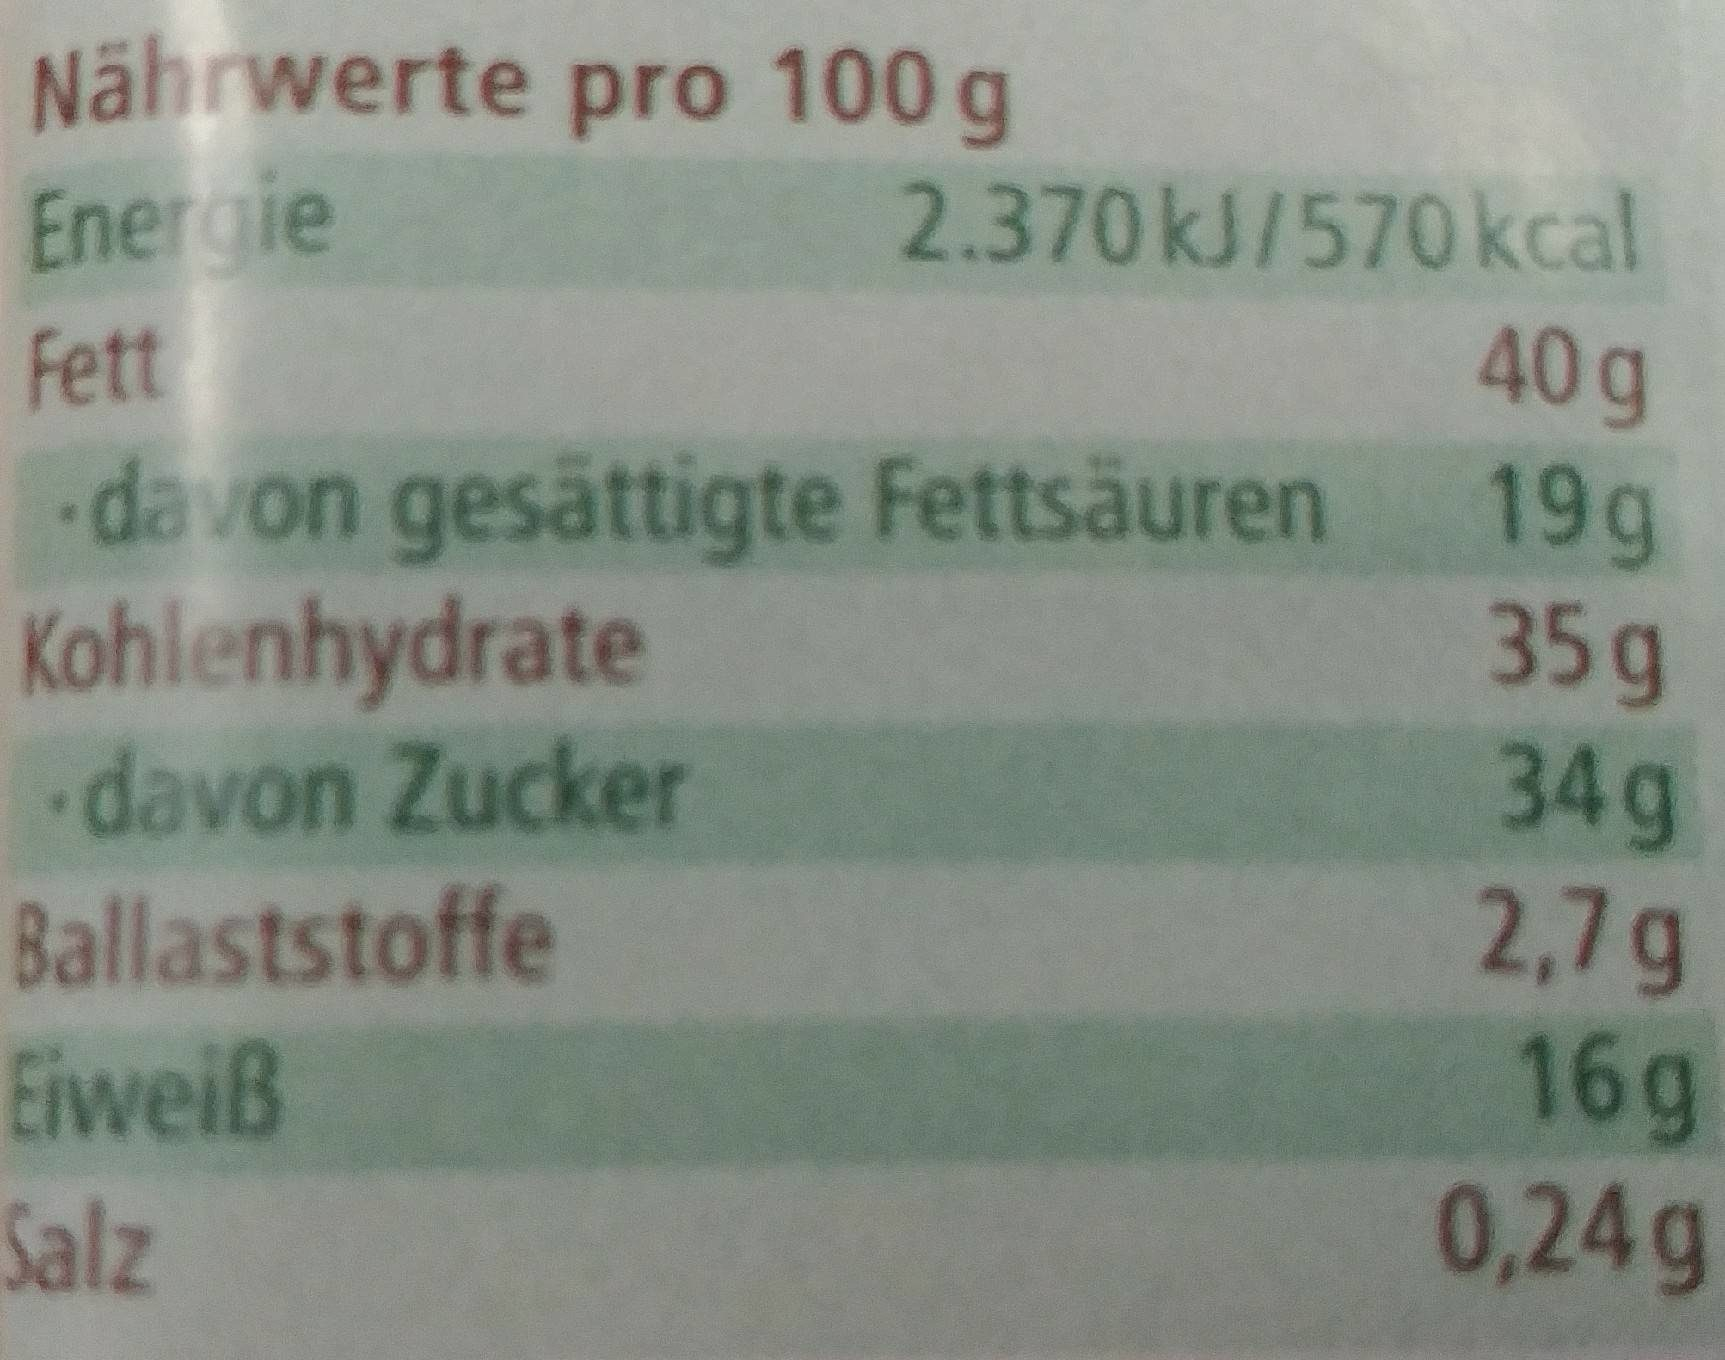 Landgarten Schoko-kürbis Vollmilch, 50 GR Beutel - Informations nutritionnelles - de